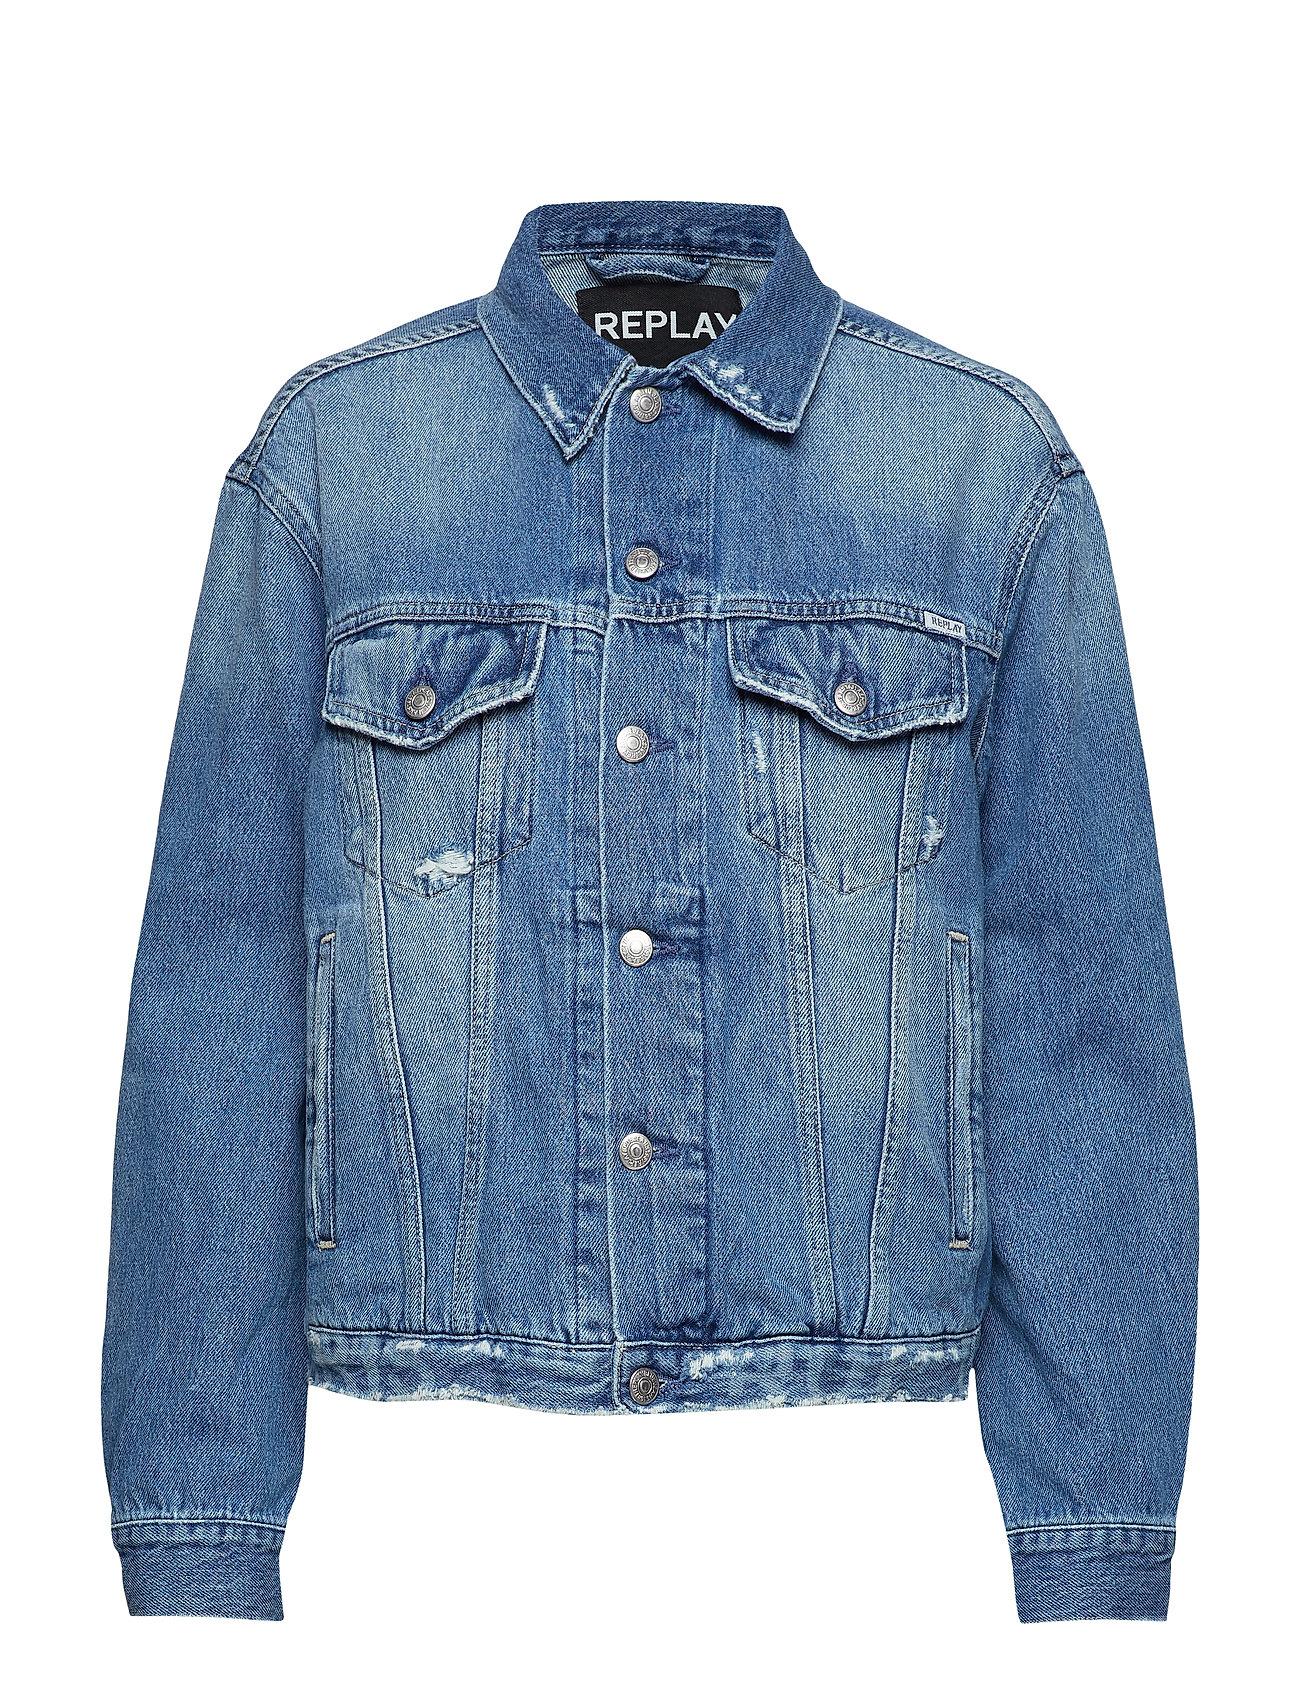 657a57e9 re jakker replay jacket - Prissøk - Gir deg laveste pris